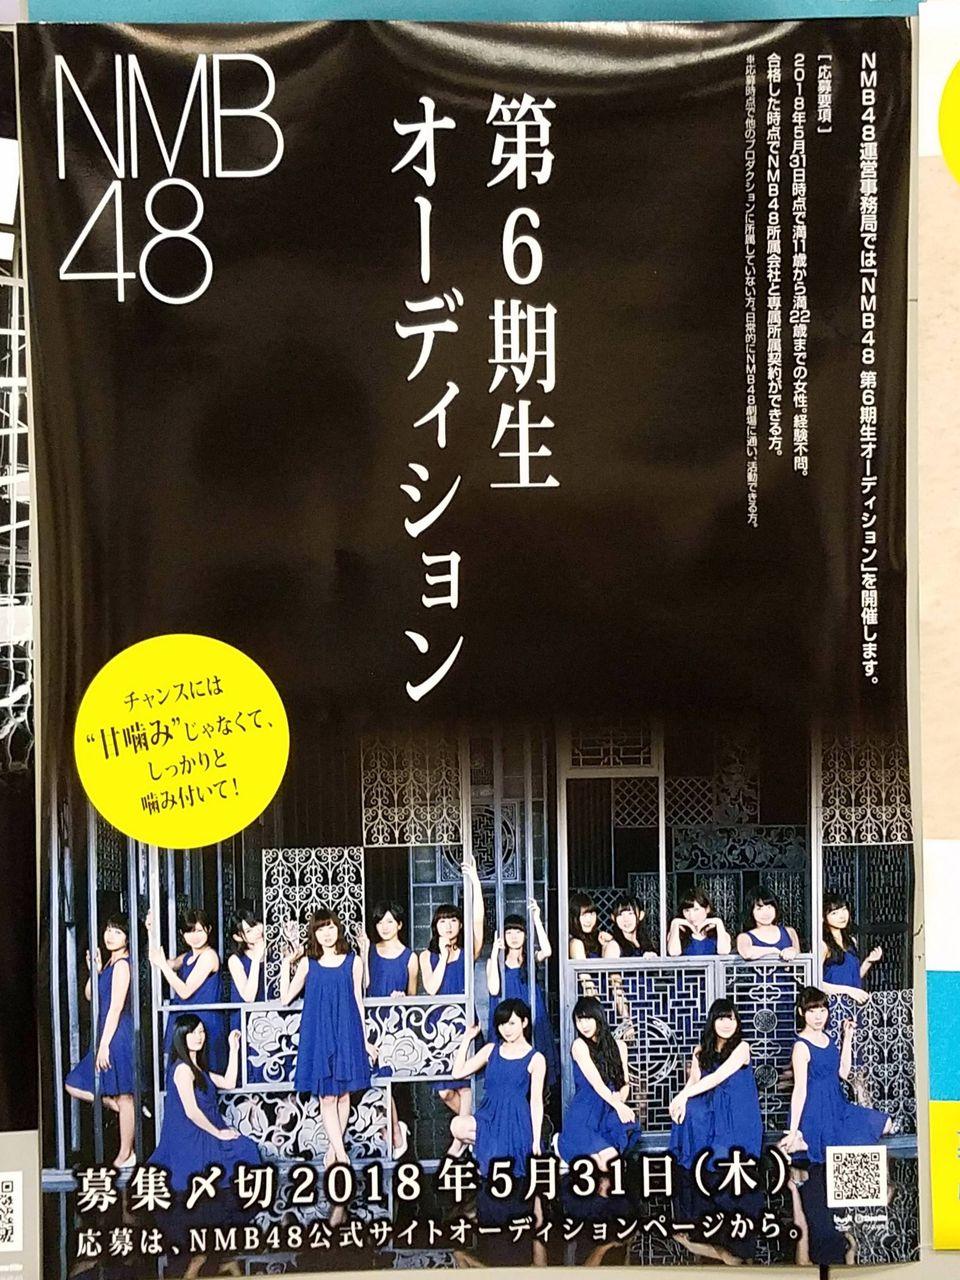 NMB48 第6期オーディション開催決定キタ━━━━(゚∀゚)━━━━!!